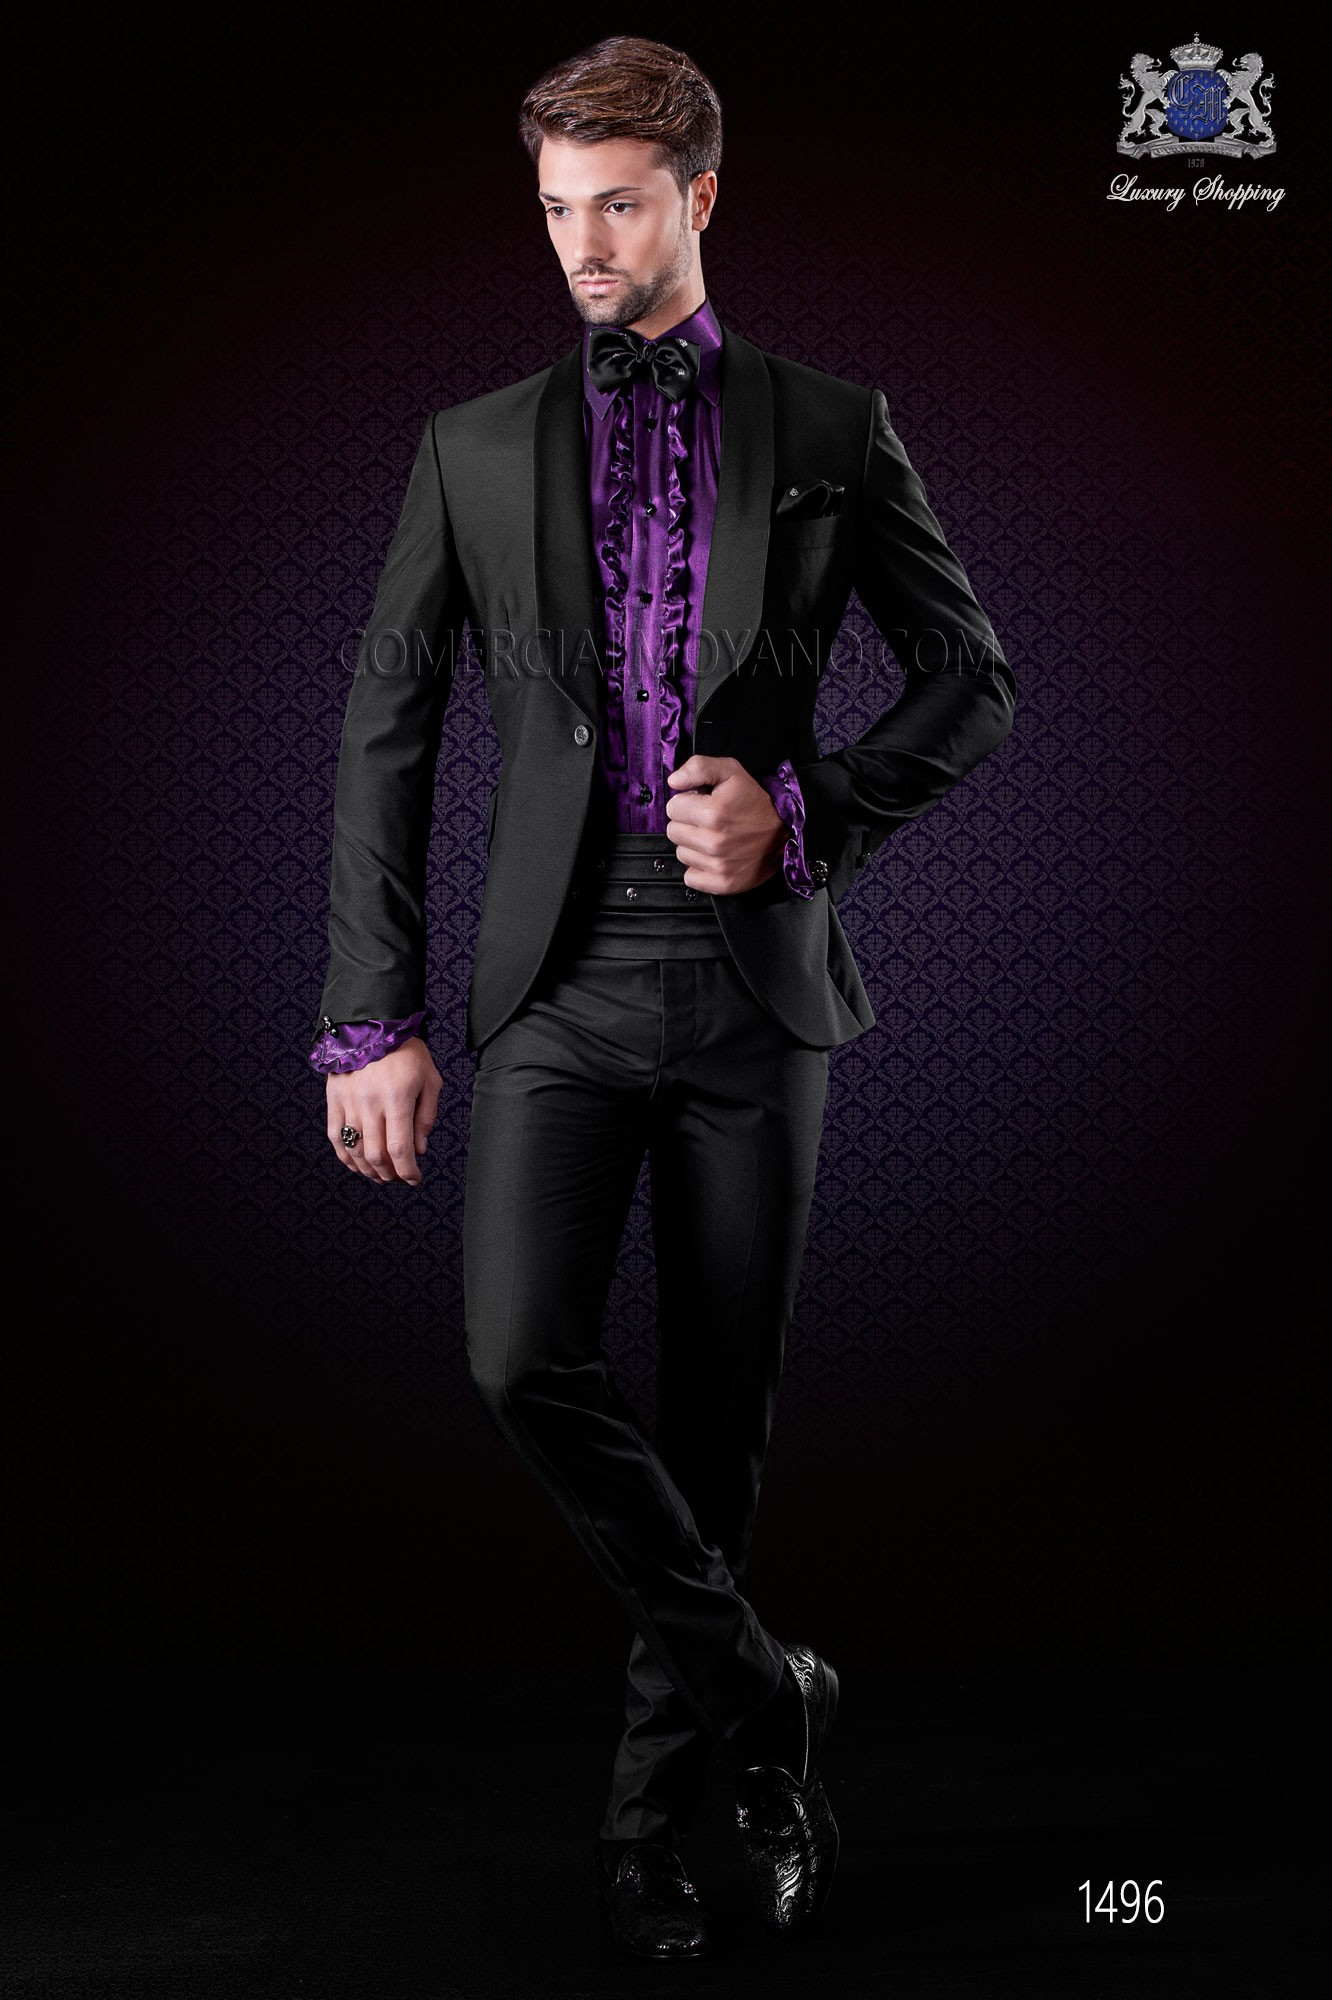 Italian wedding suit black tuxedo slim fit Ottavio Nuccio Gala